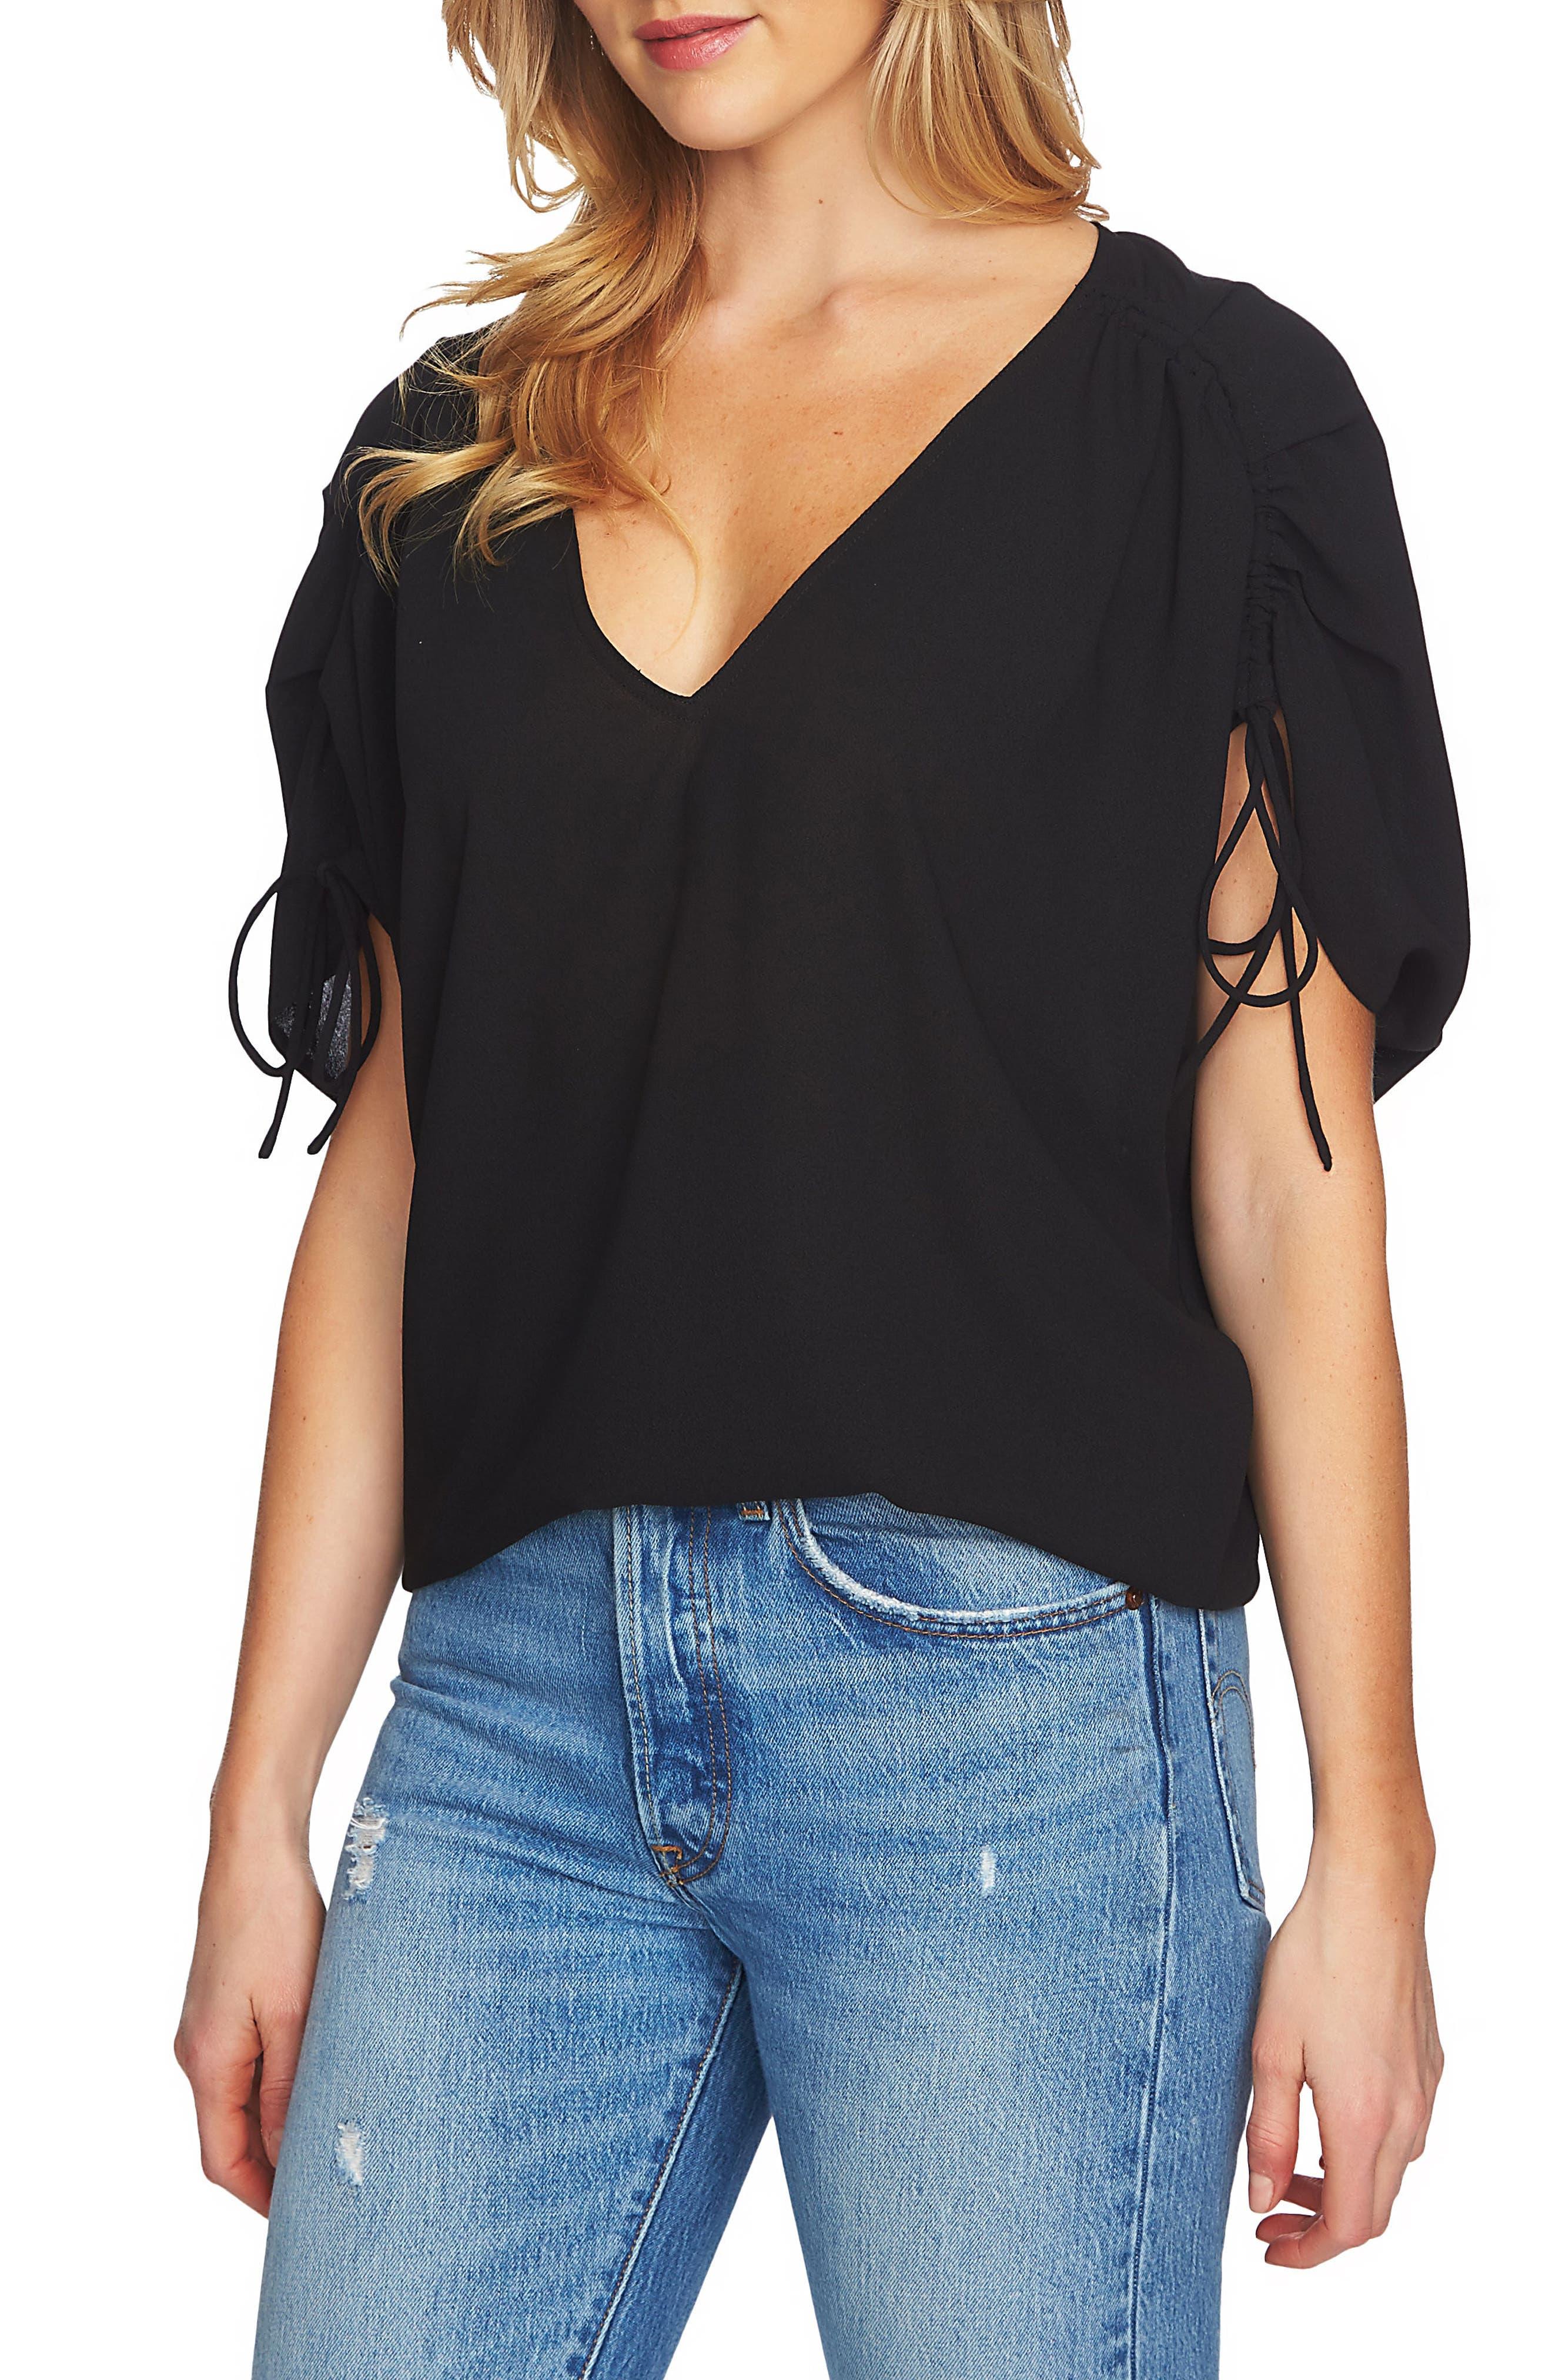 Cinch Sleeve Blouse,                         Main,                         color, 060-Rich Black